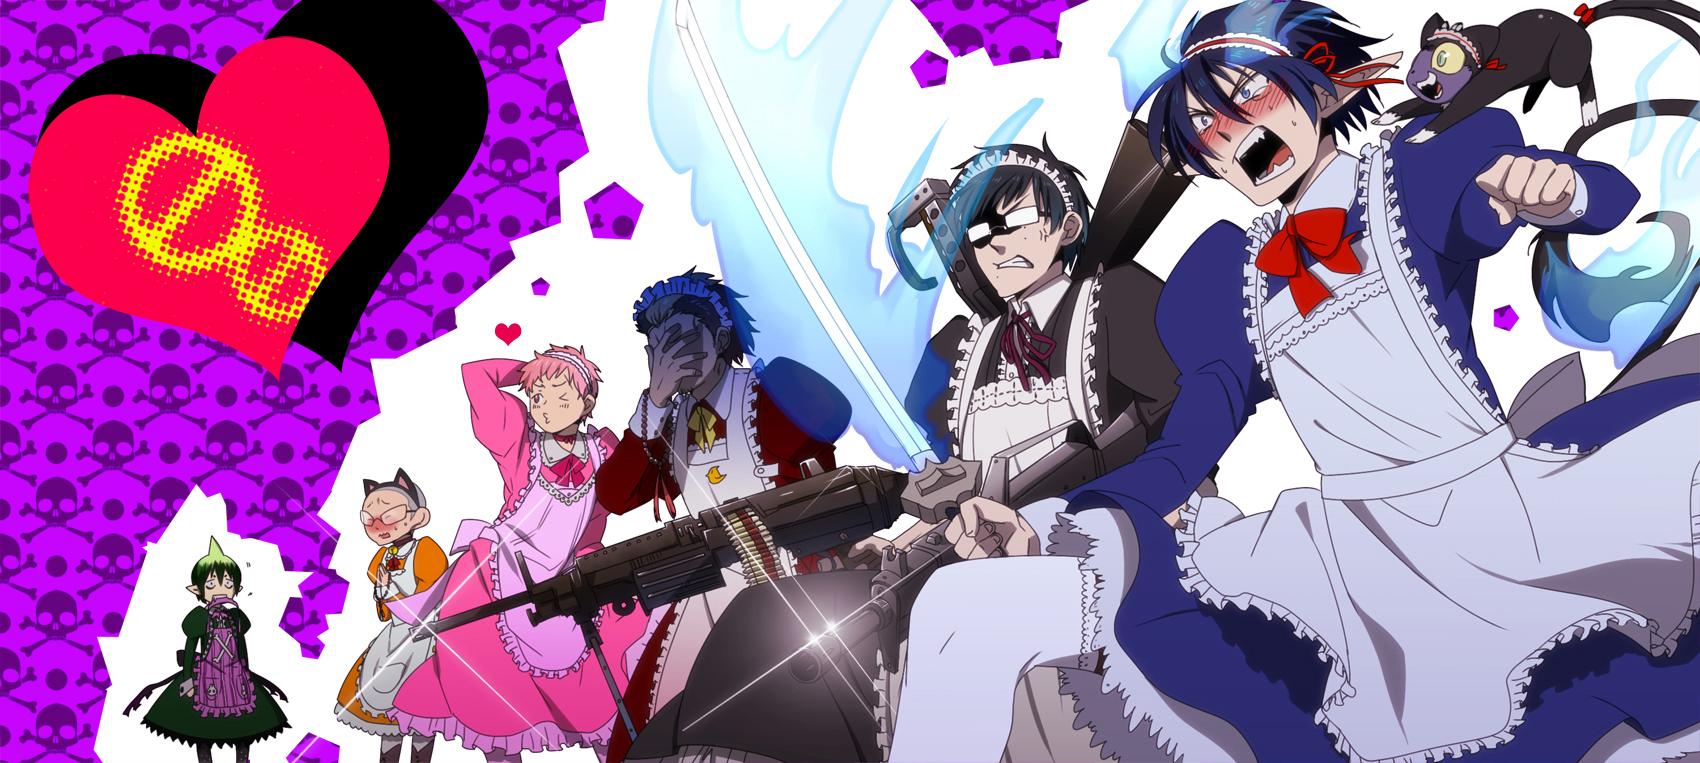 ao no exorcist blue exorcist katou kazue zerochan anime image